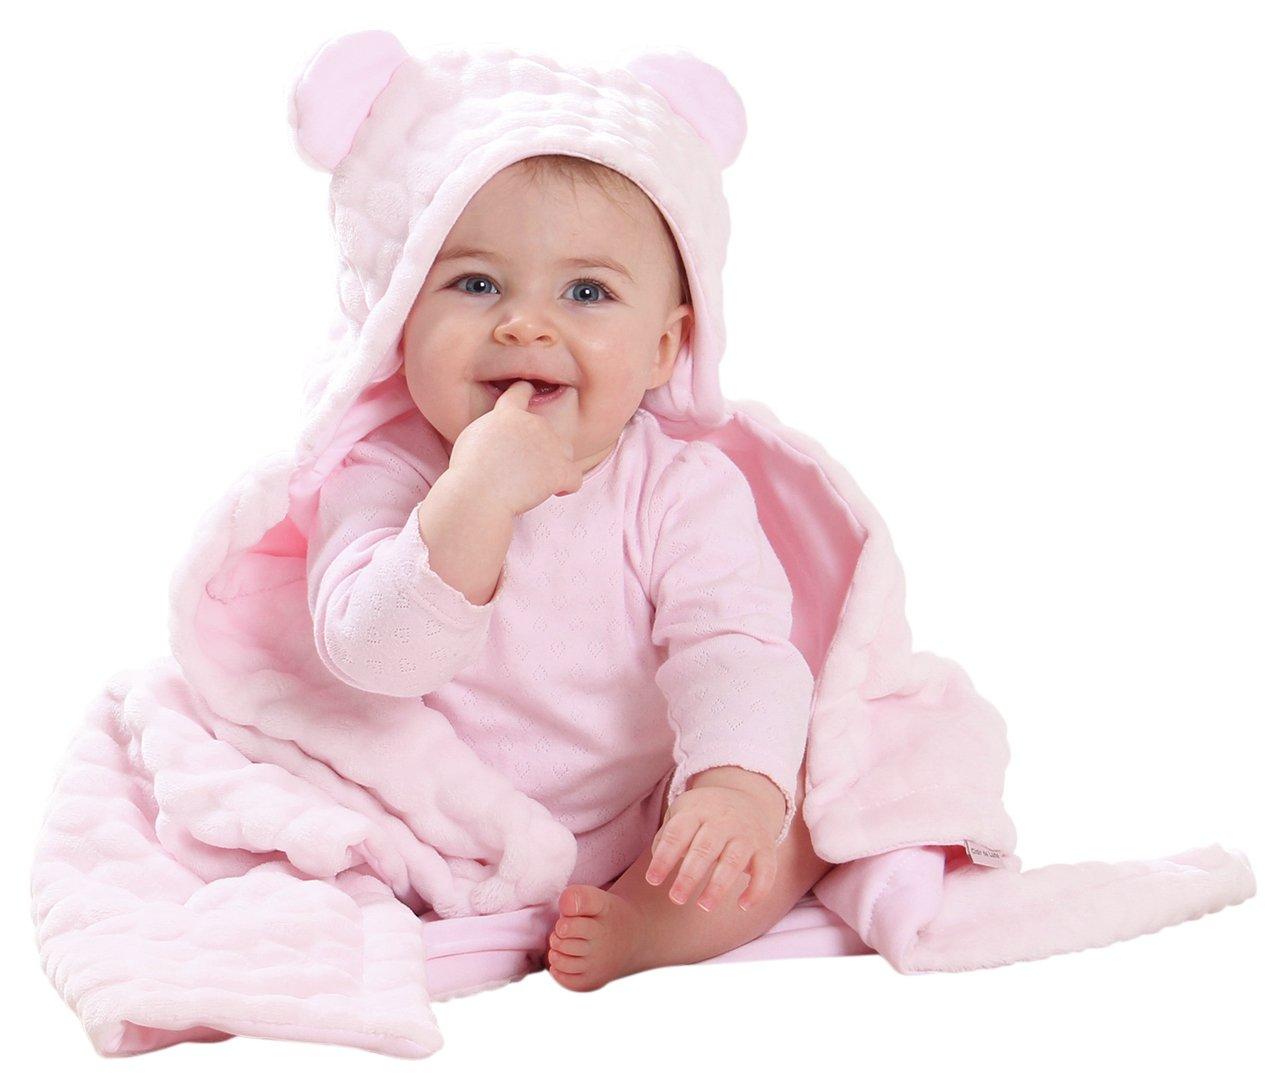 Image of Clair de Lune Marshmallow Teddybear Ear Blanket - Pink.